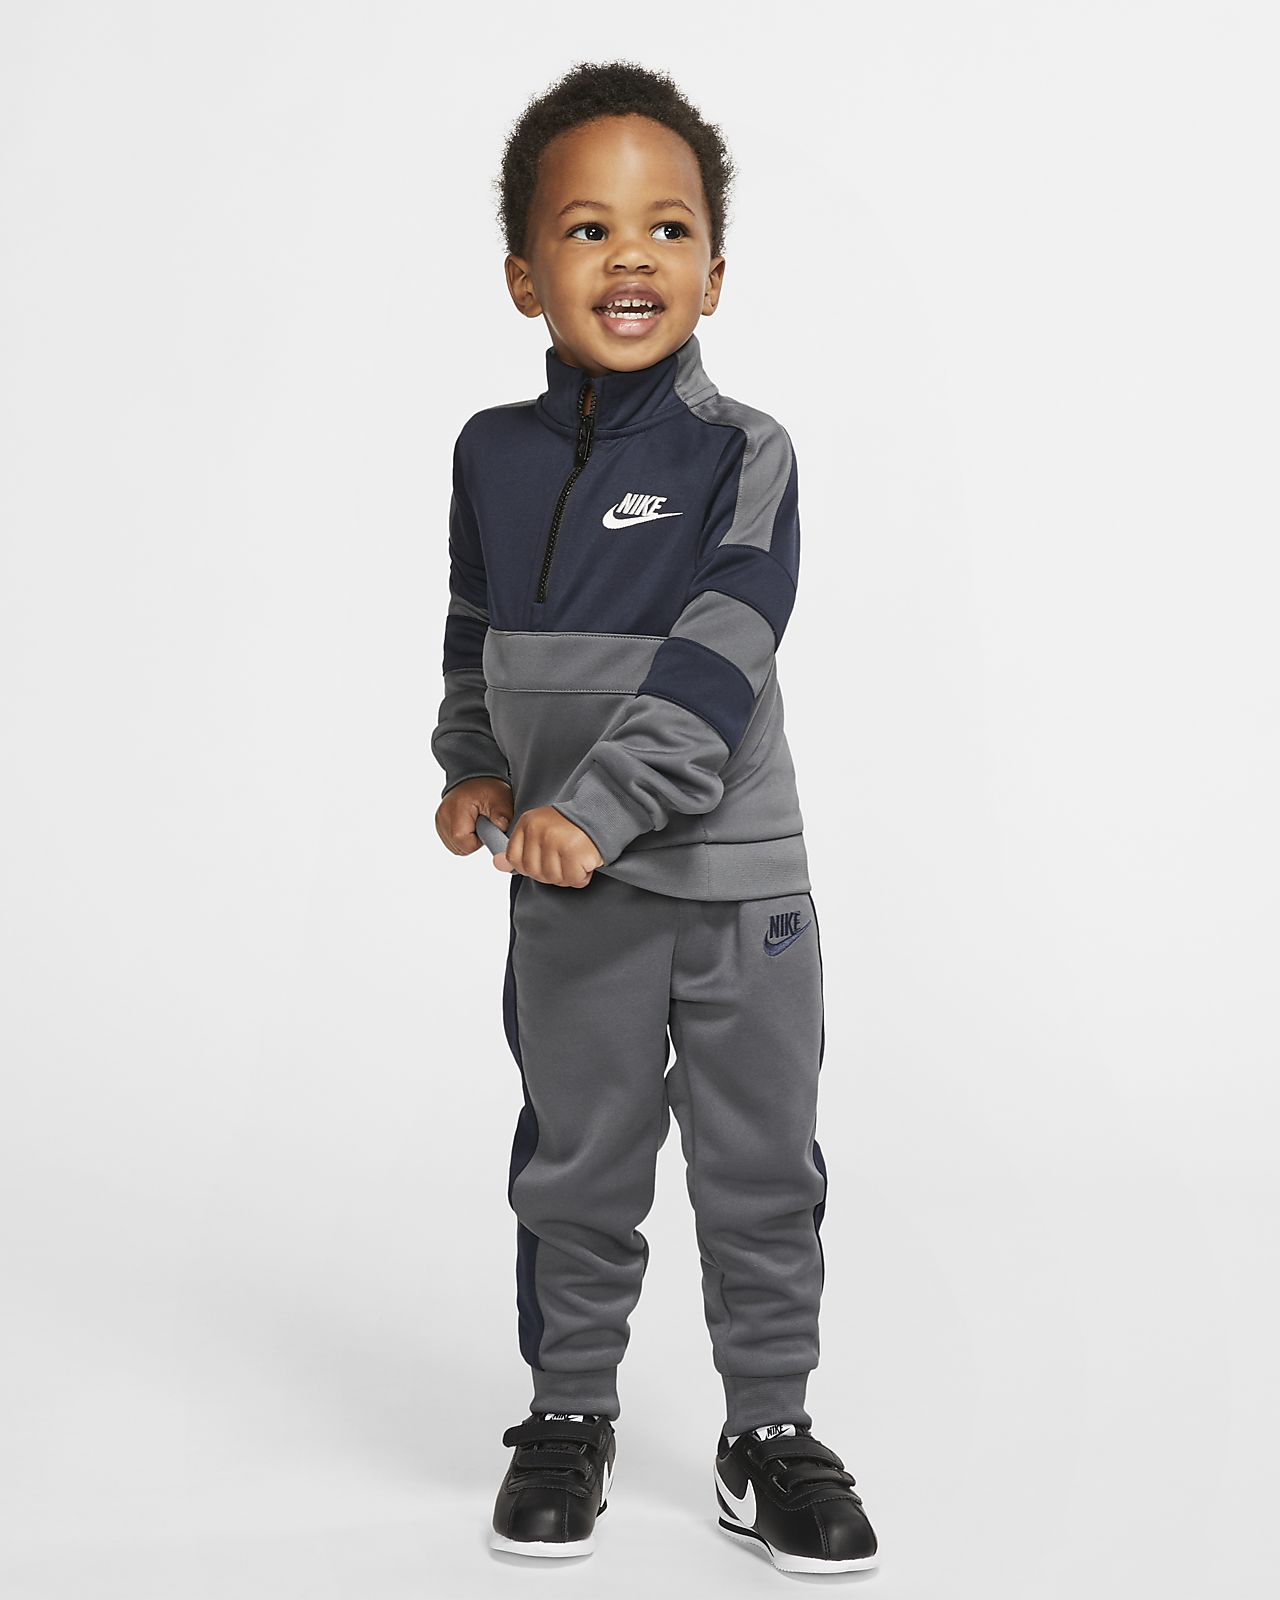 Completo in 2 pezzi Nike Sportswear - Bimbi piccoli